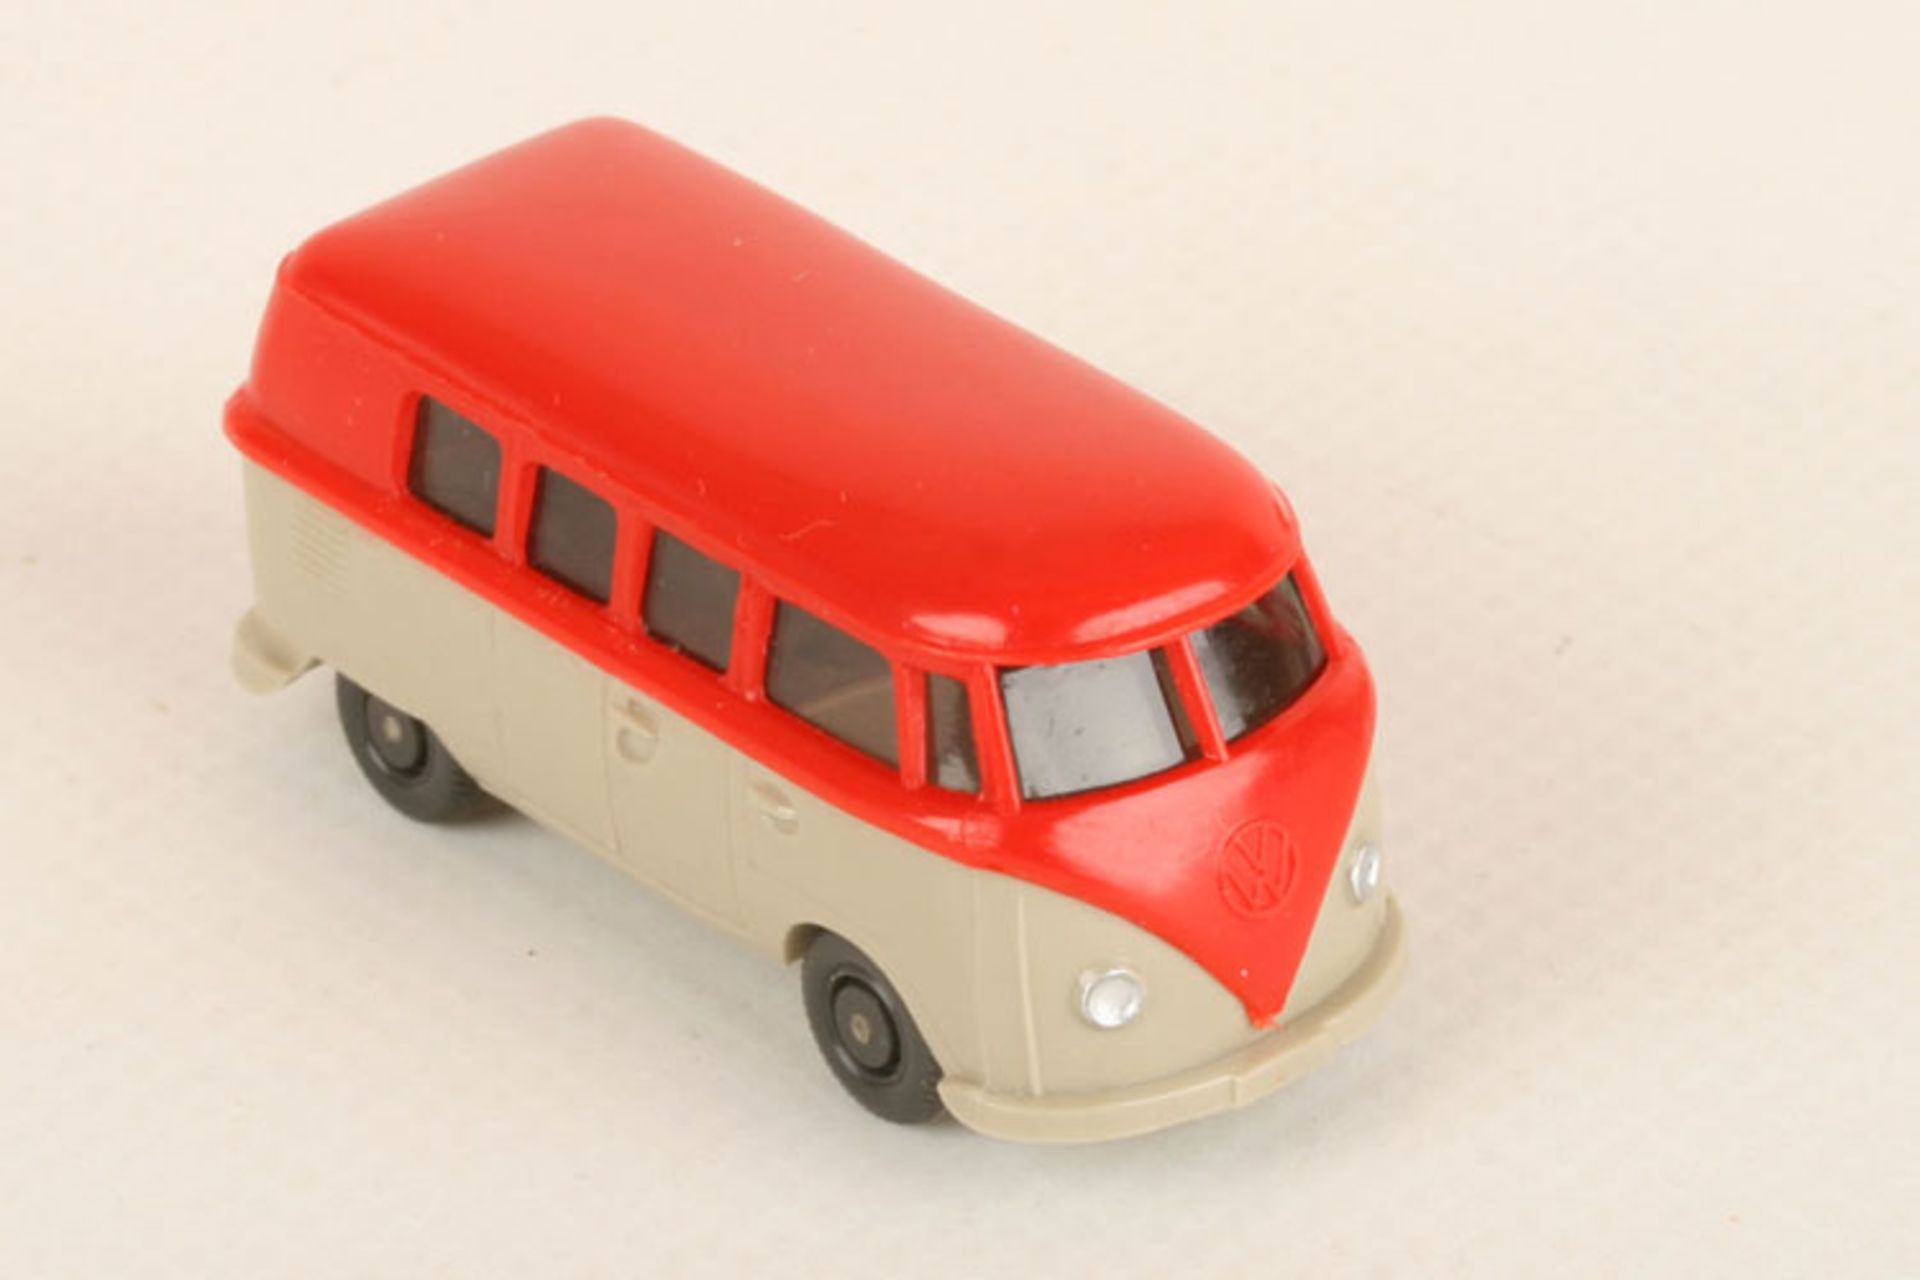 Los 1051 - Wiking VW T1 Kombi orangerot/hellgelbgrau 310/8d, etwas produktionsbedingter Klebstoffübertritt